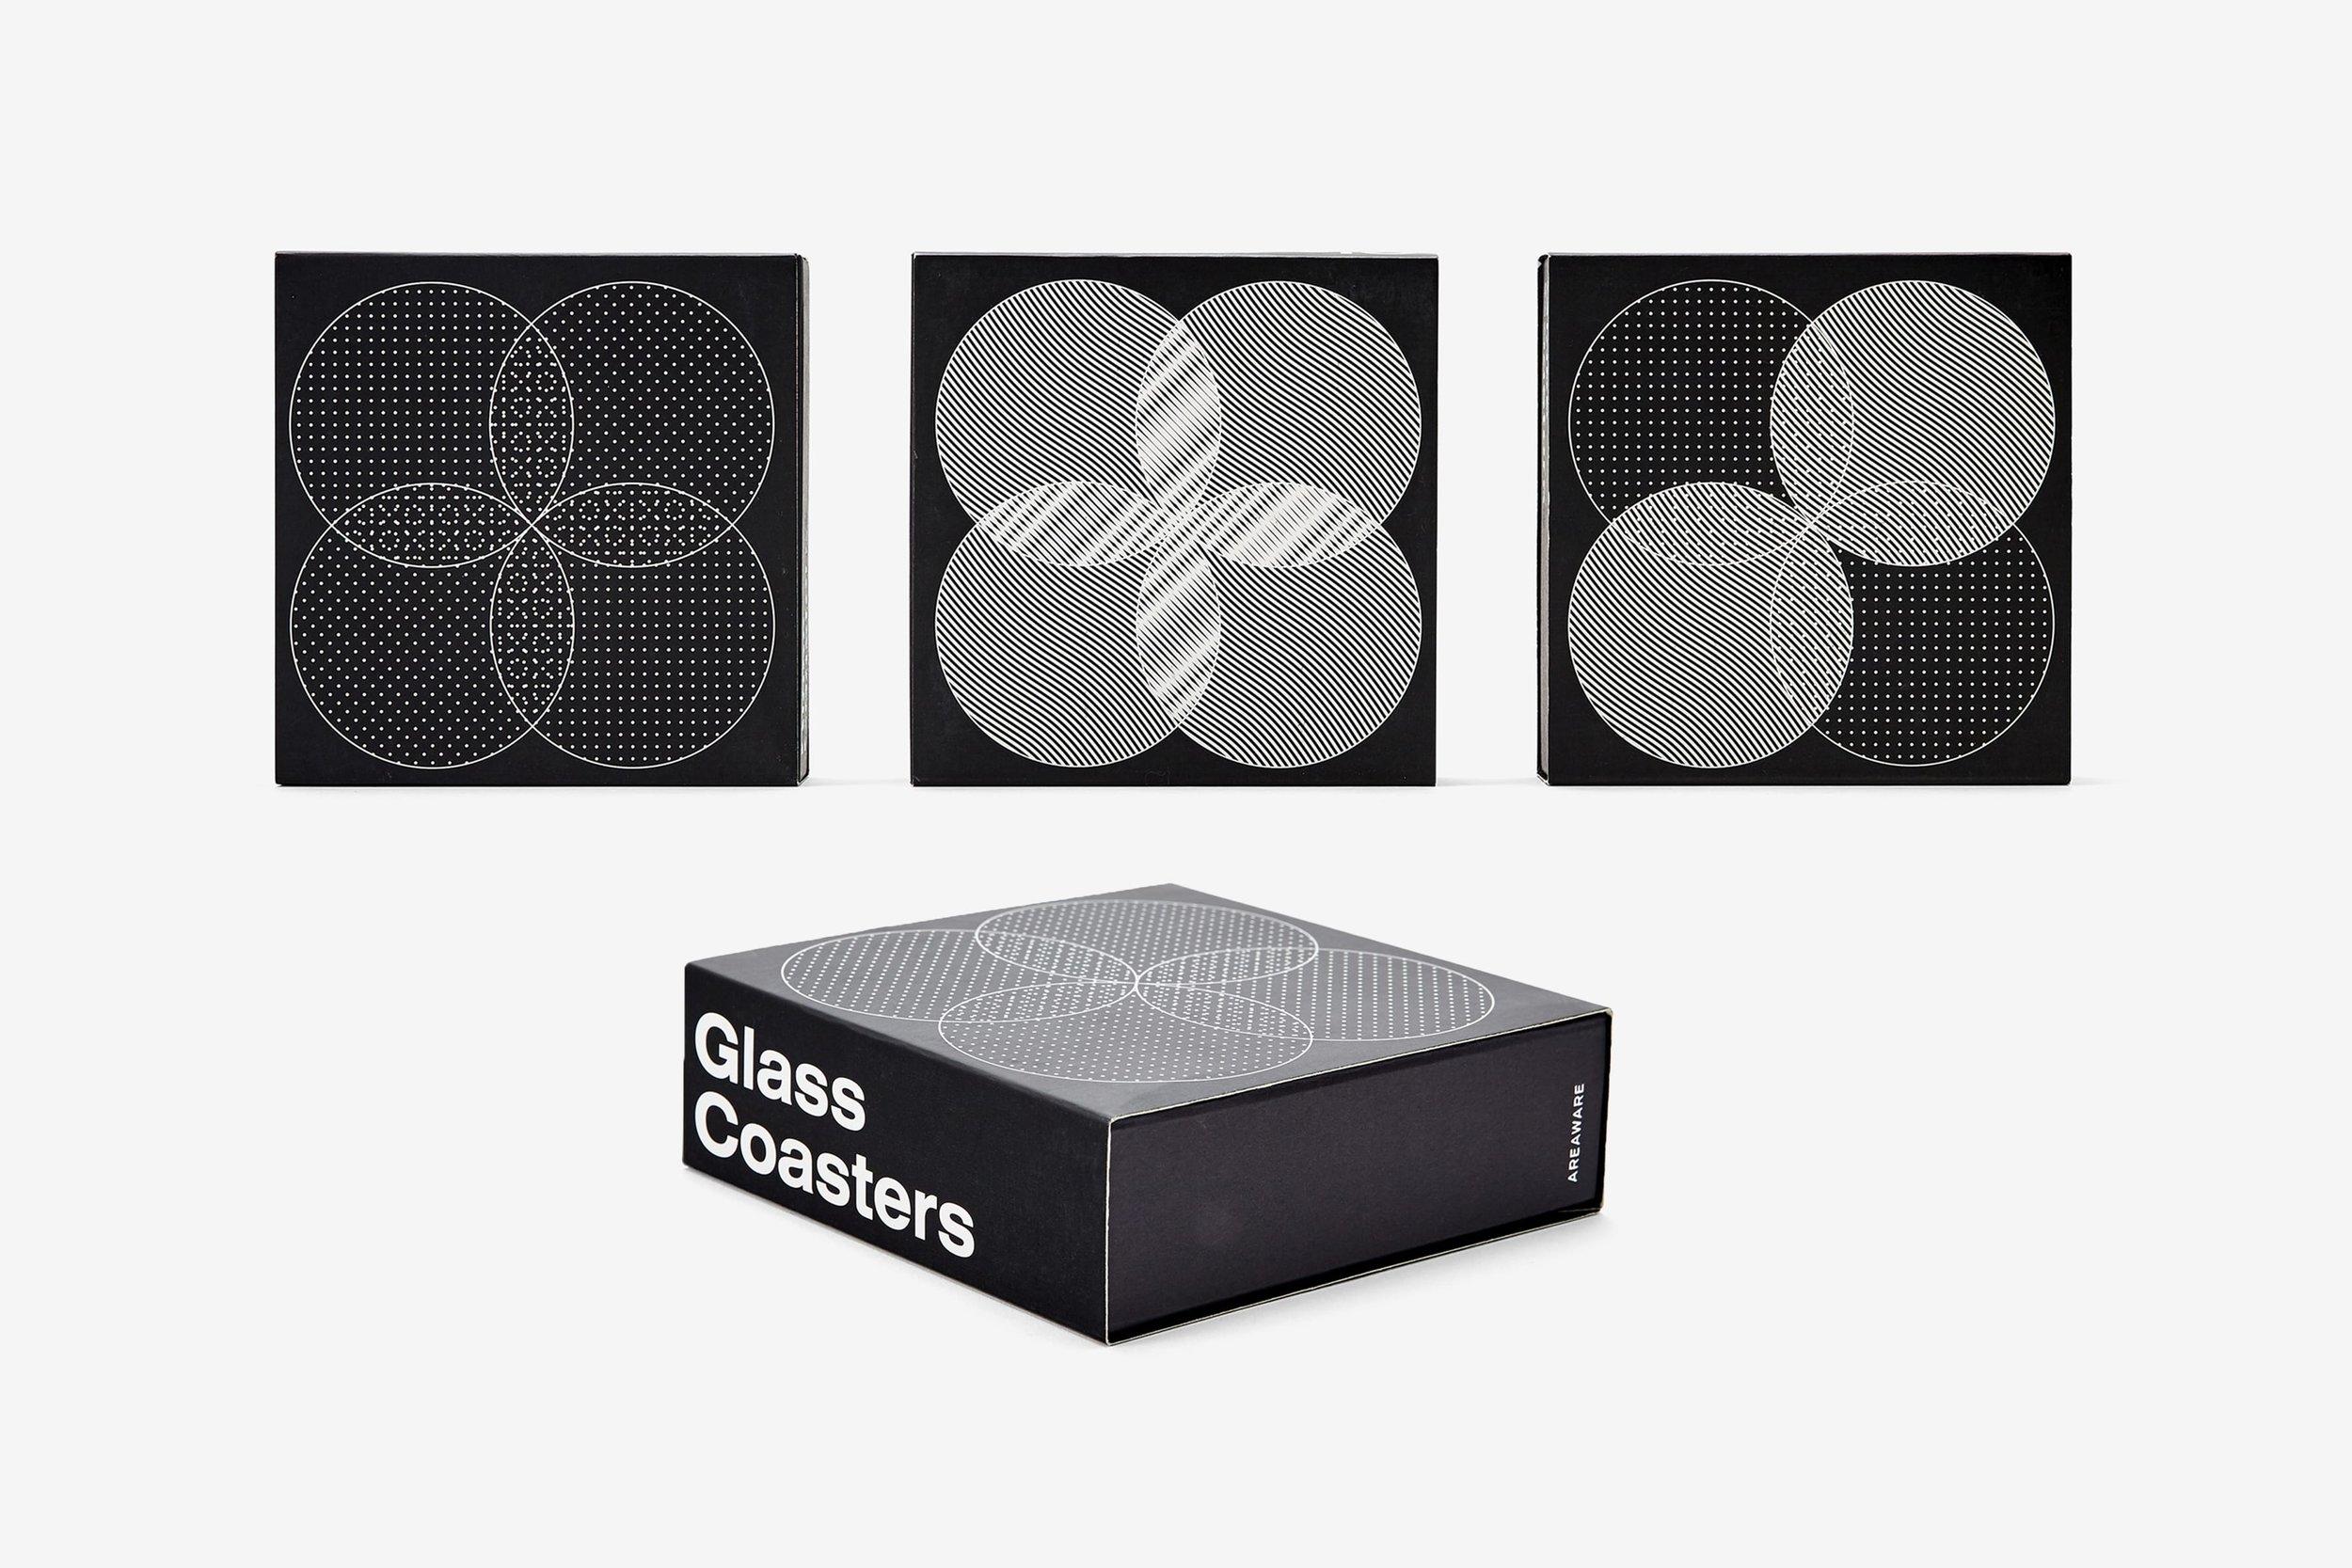 GlassGridCoasters-port-A.jpg